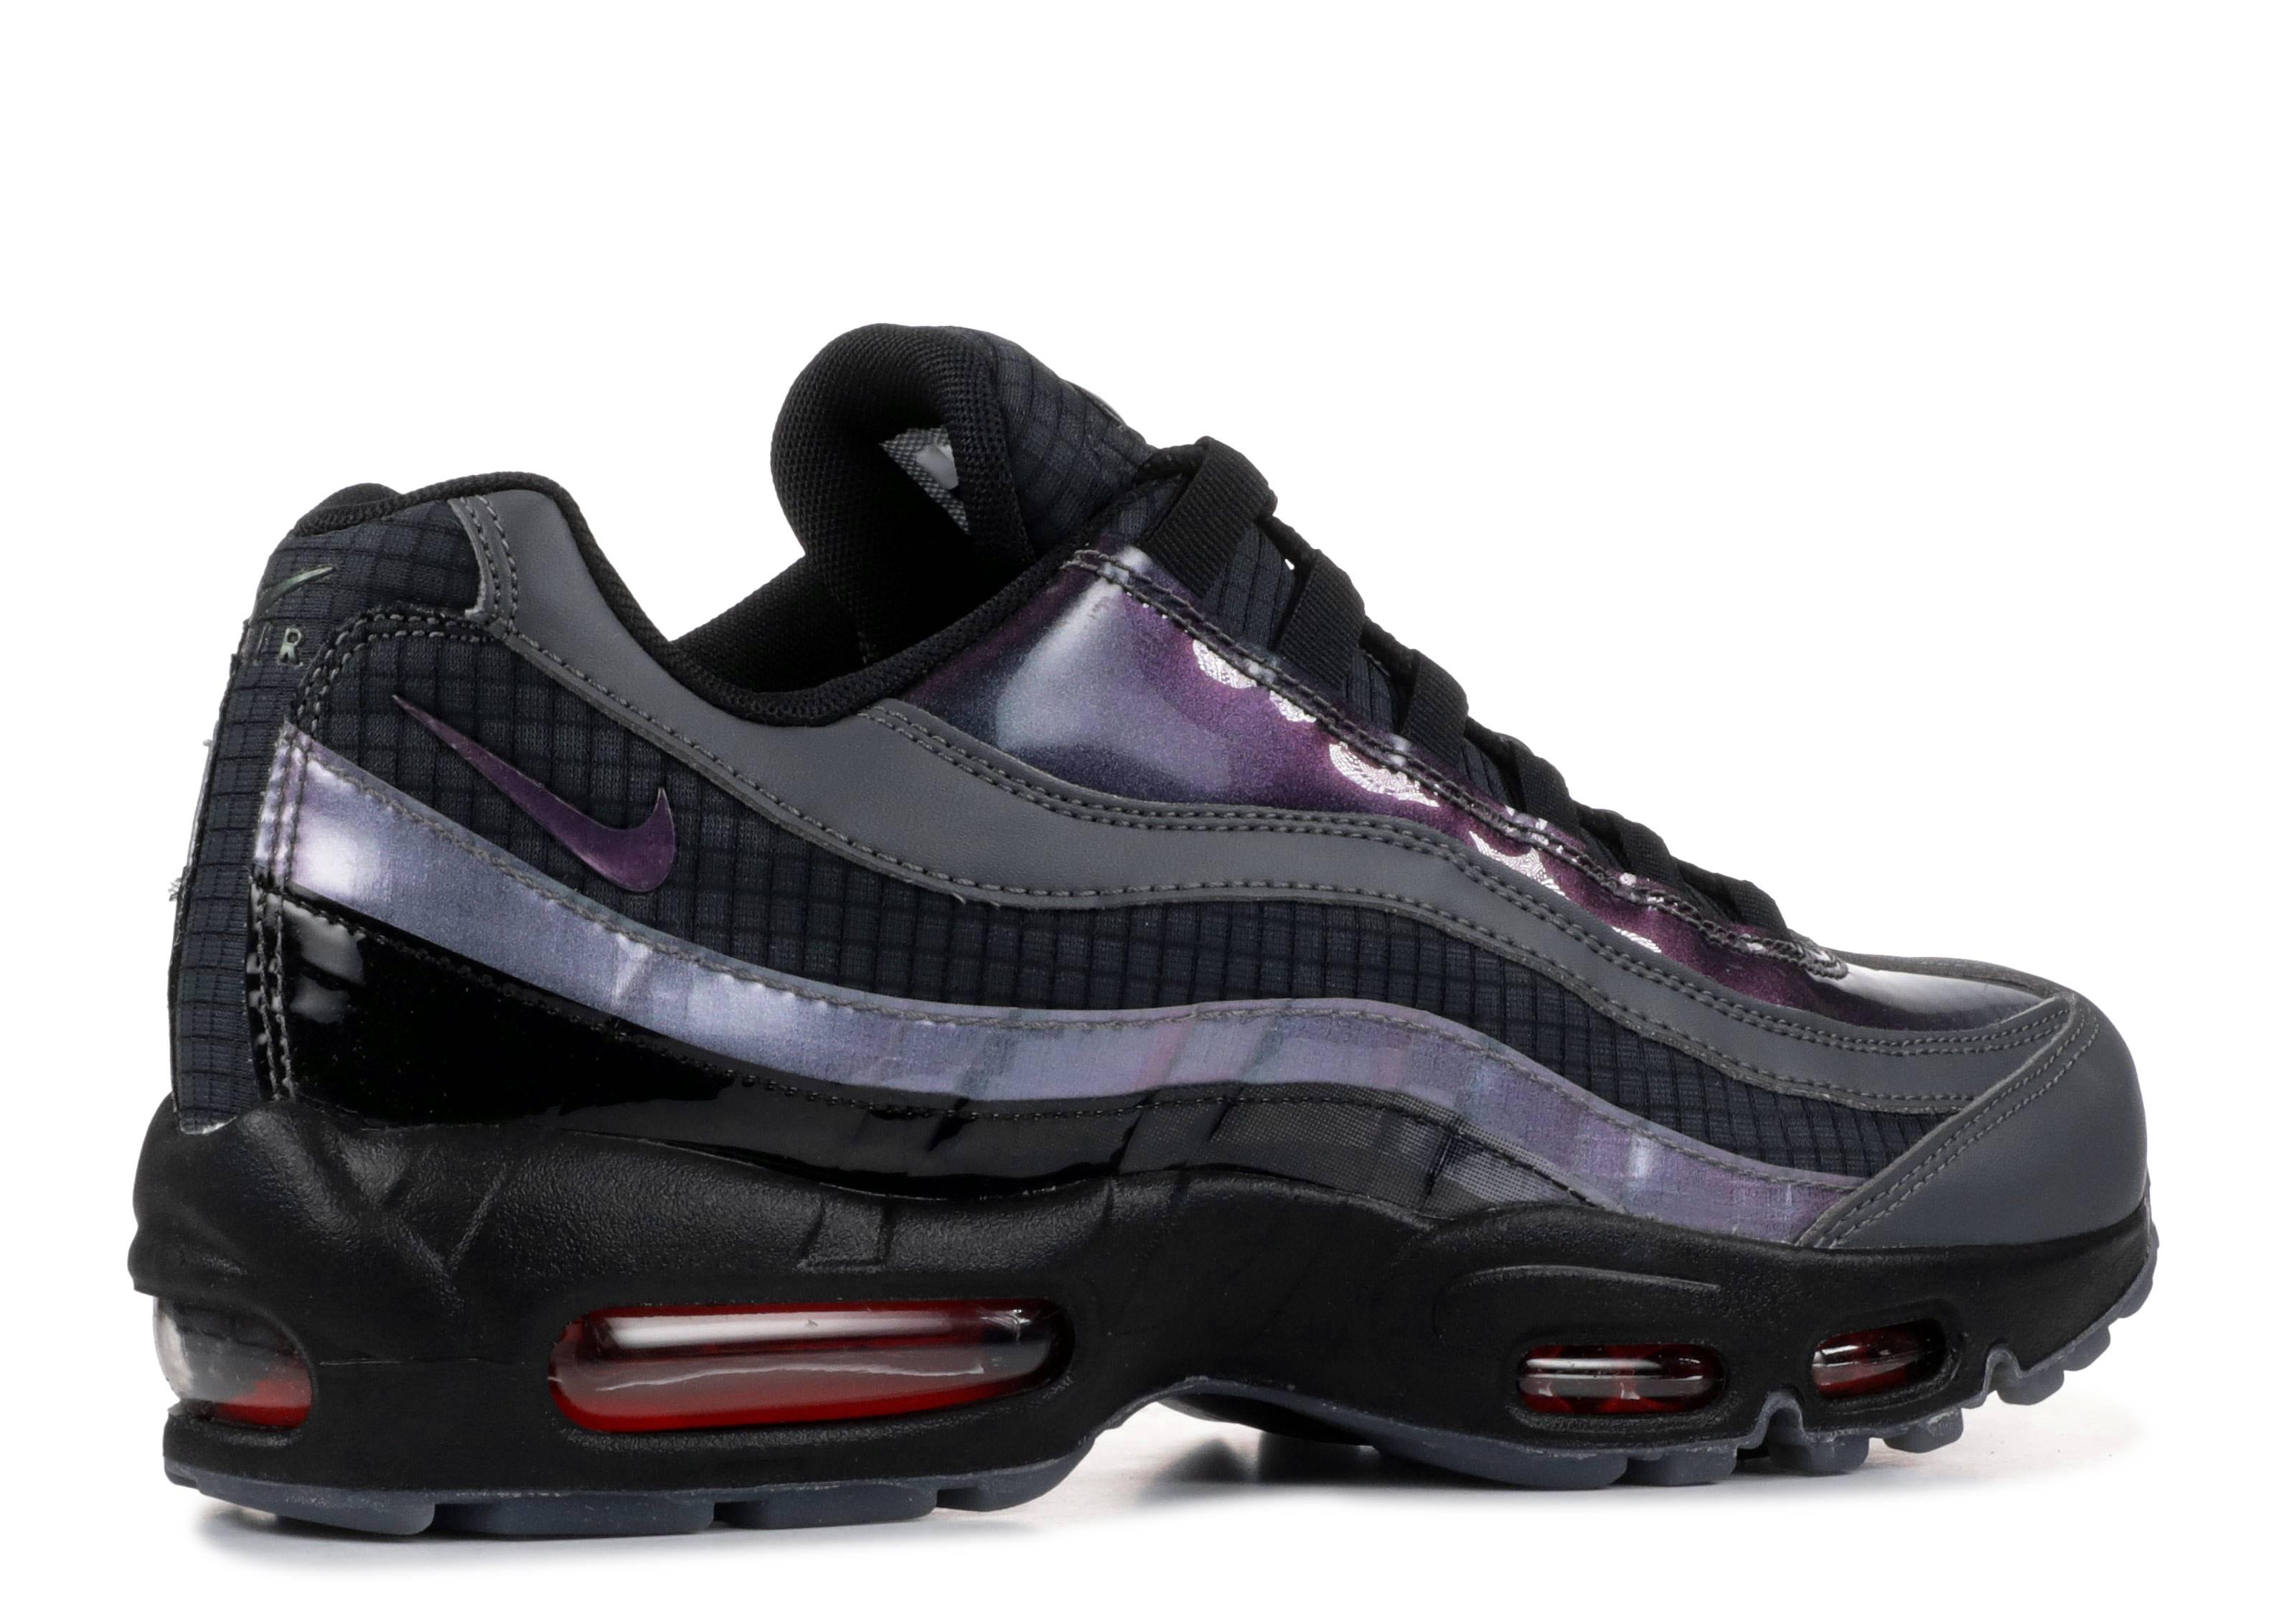 Nike Air Max 95 Ember Glow Black Dark Grey Men Running